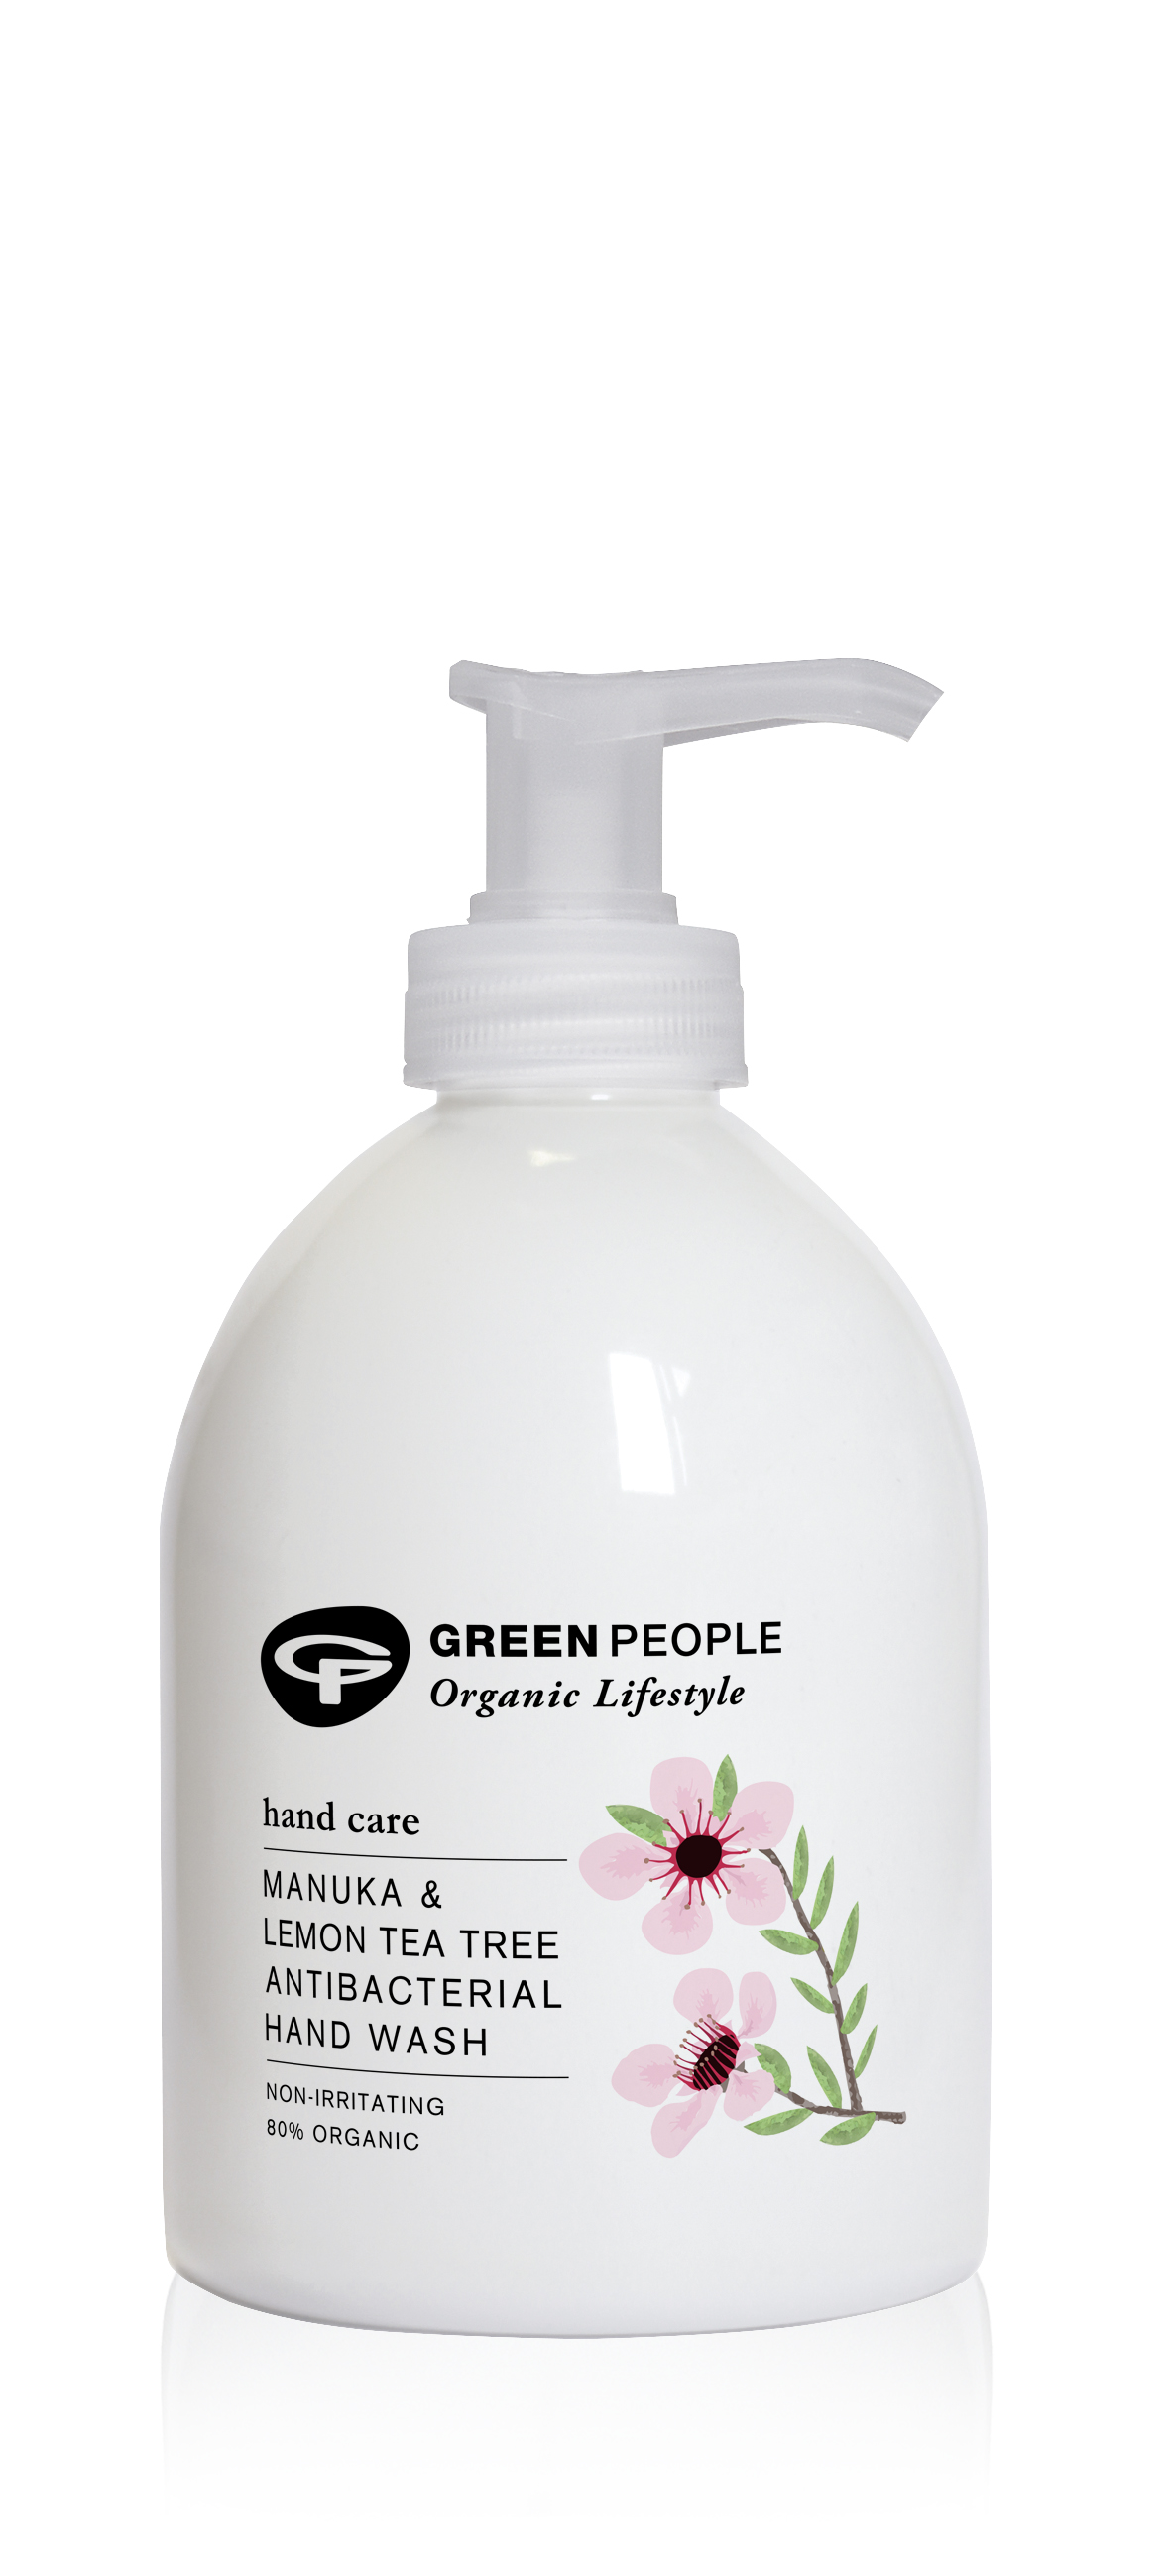 Manuka and Lemon Tea Tree Antibacterial Hand Wash 300ml